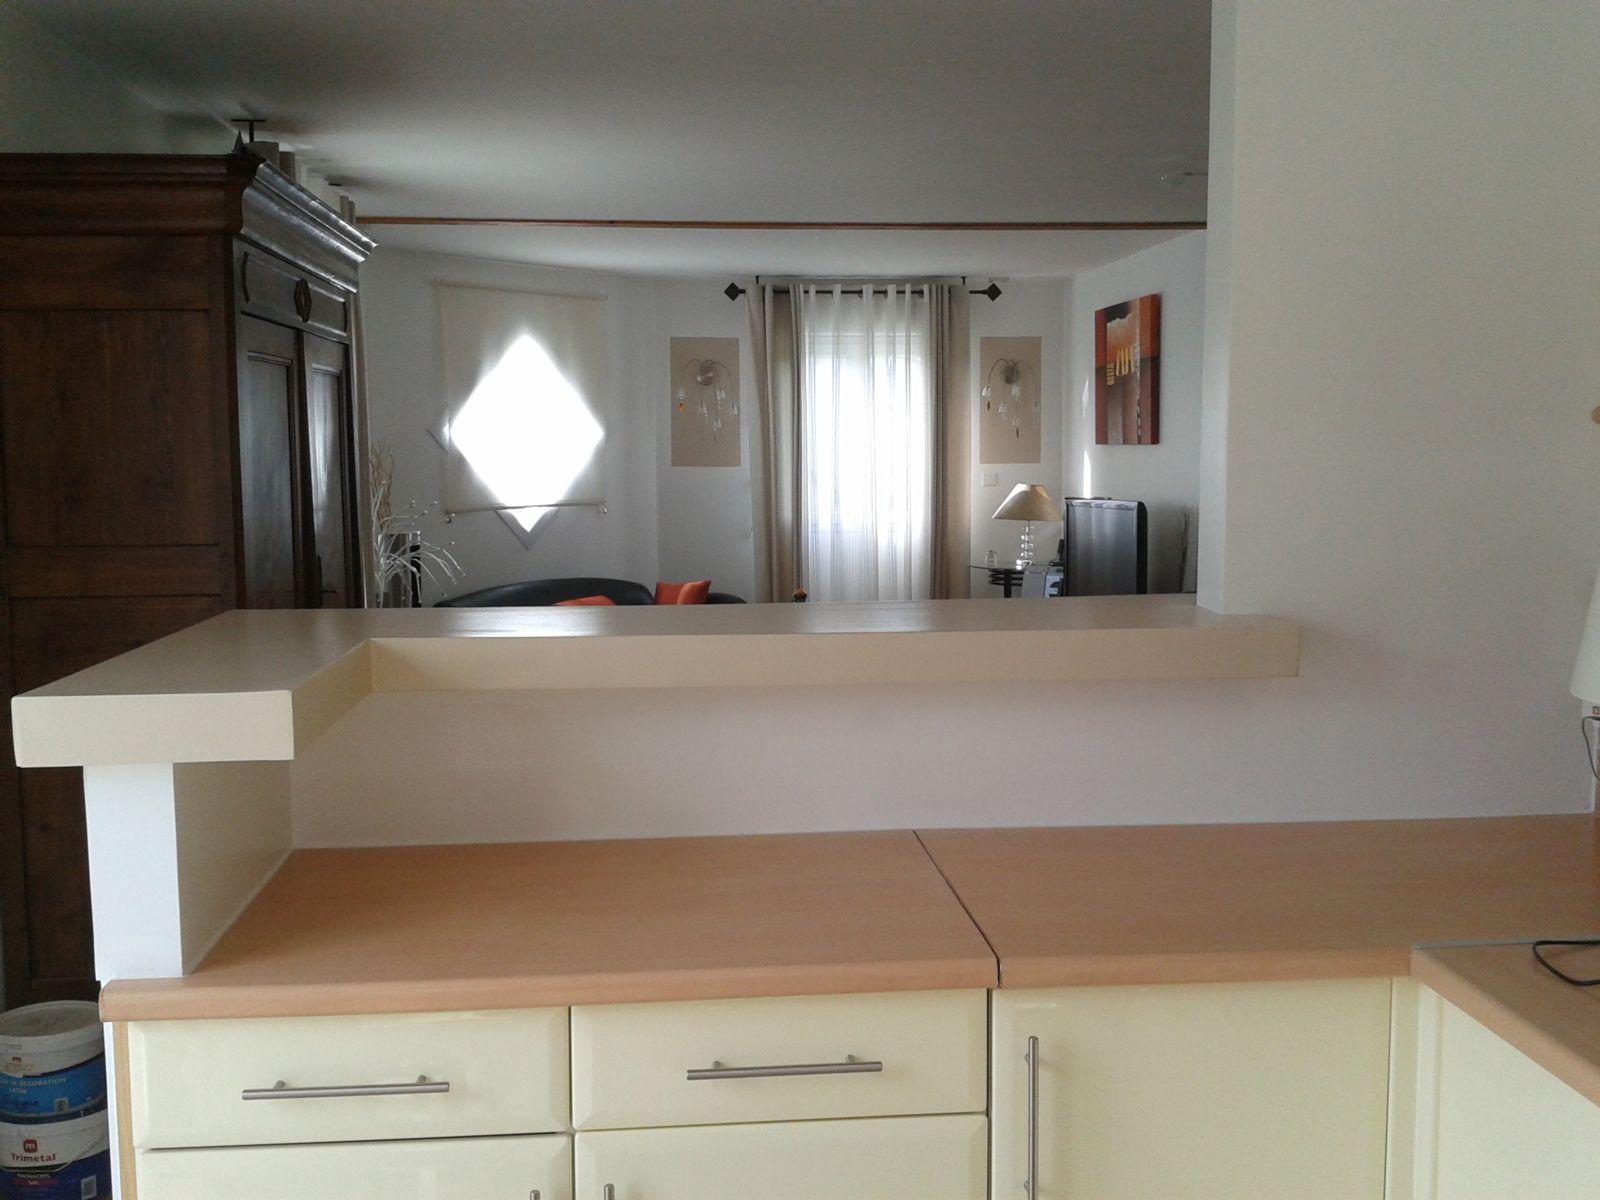 Nos r alisations pinto garcia antonio sikkens solutions - Plaque de platre salle de bain ...